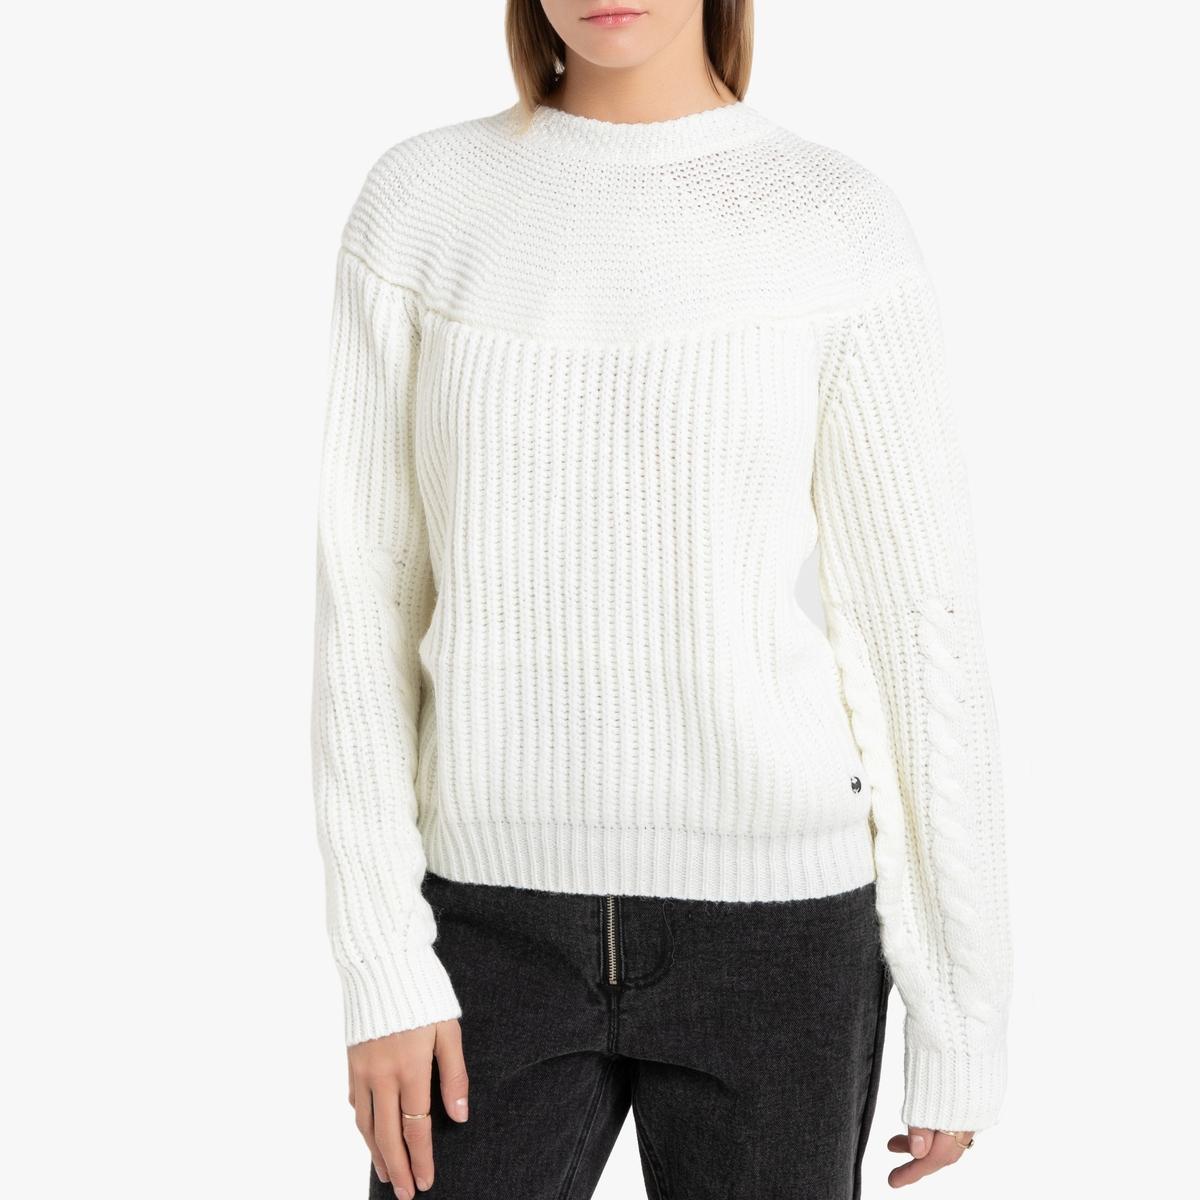 Пуловер La Redoute Из плотного трикотажа с вырезом с бантом сзади M бежевый пуловер la redoute с круглым вырезом из плотного трикотажа 3xl бежевый